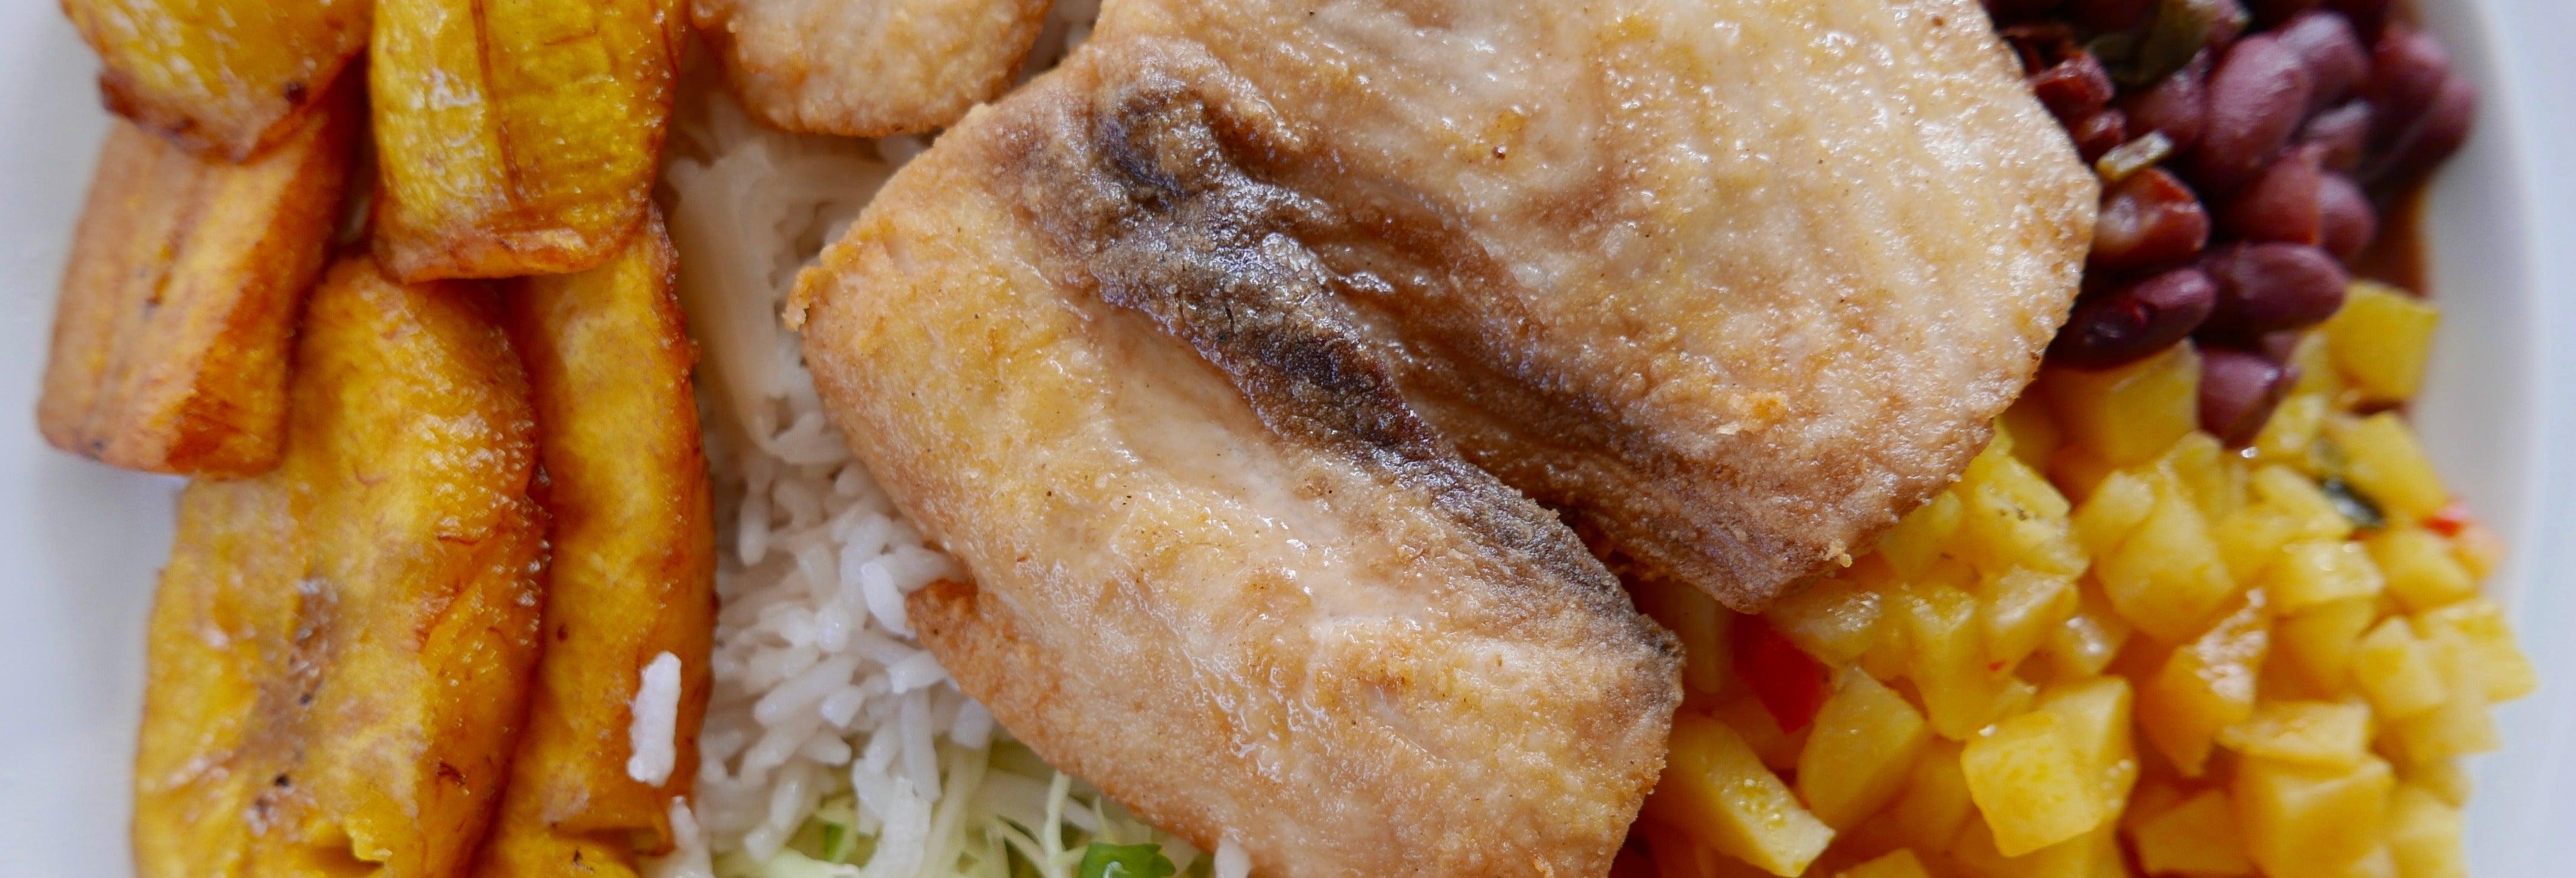 Tour gastronomico di San José